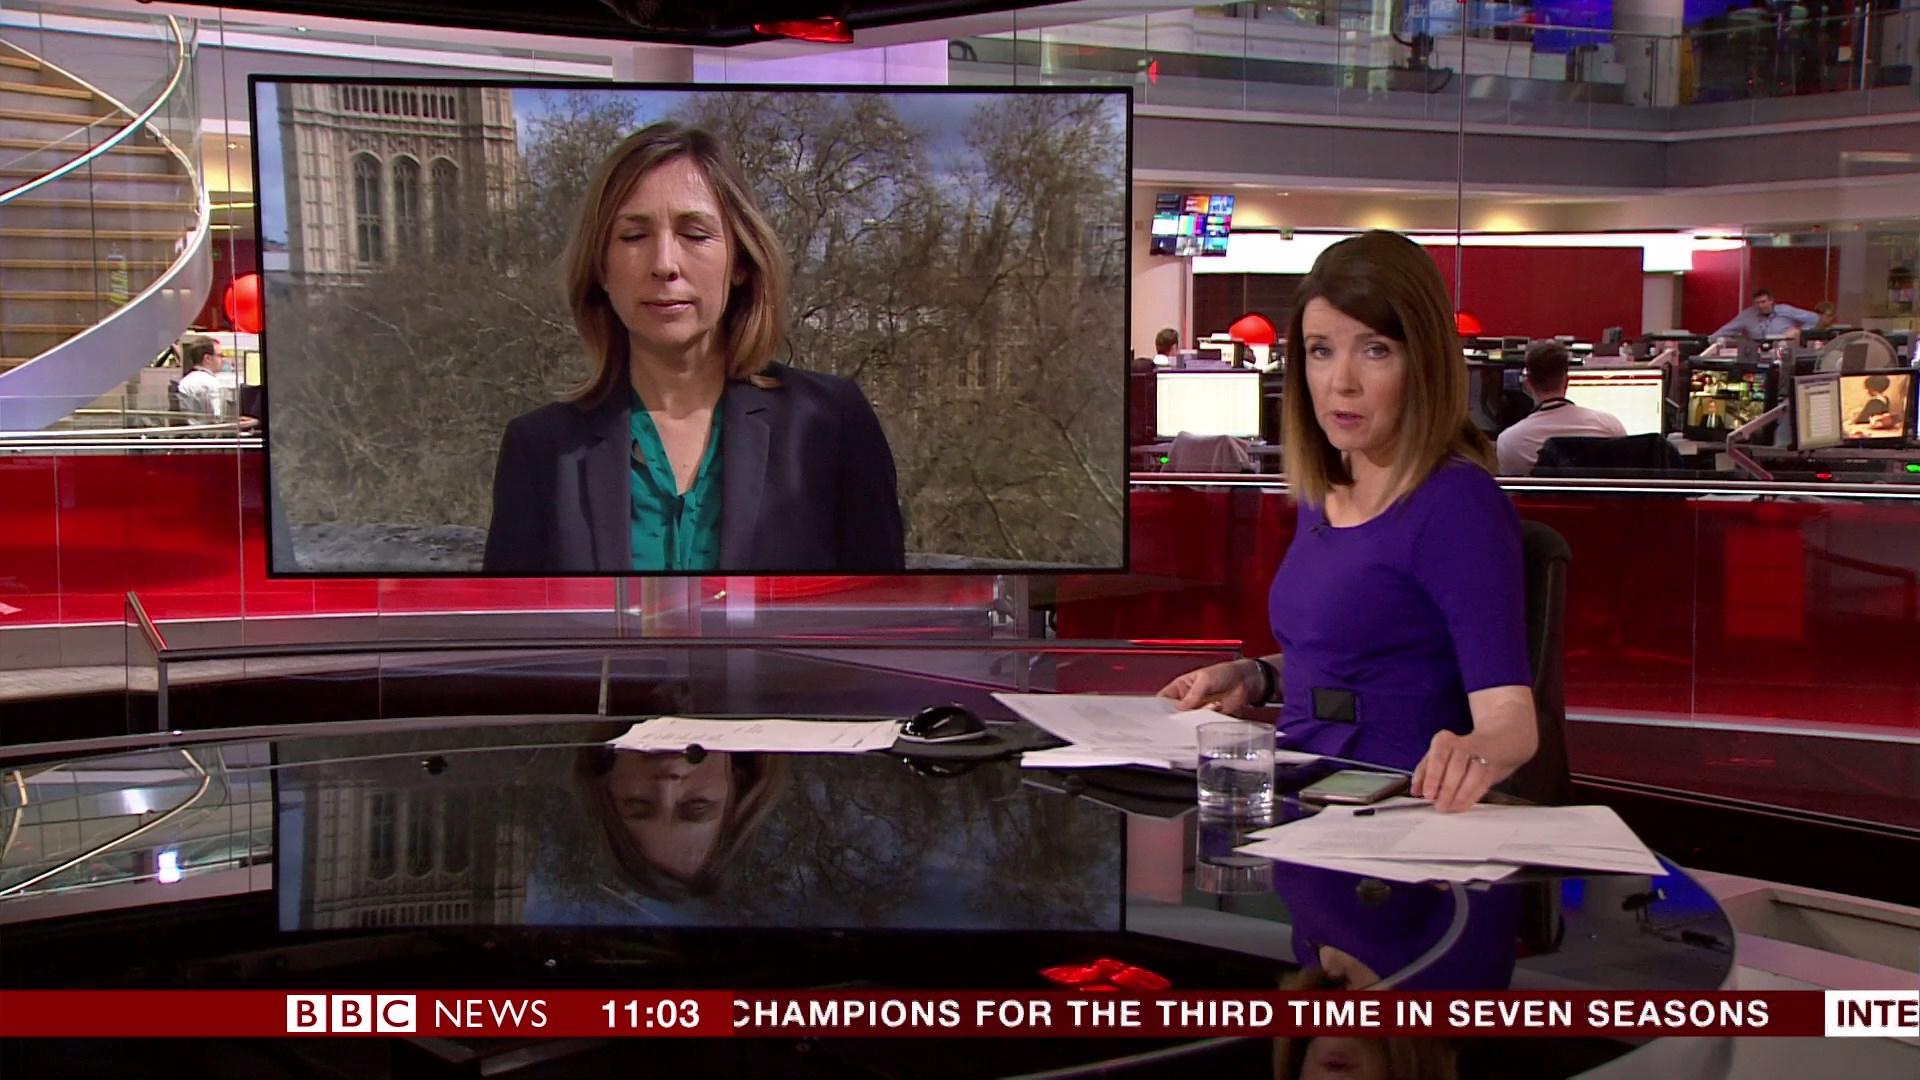 68343680_bbc-newsroom-live_20180416_11001200-ts_snapshot_00-04-33_-2018-04-16_17-08-11.jpg